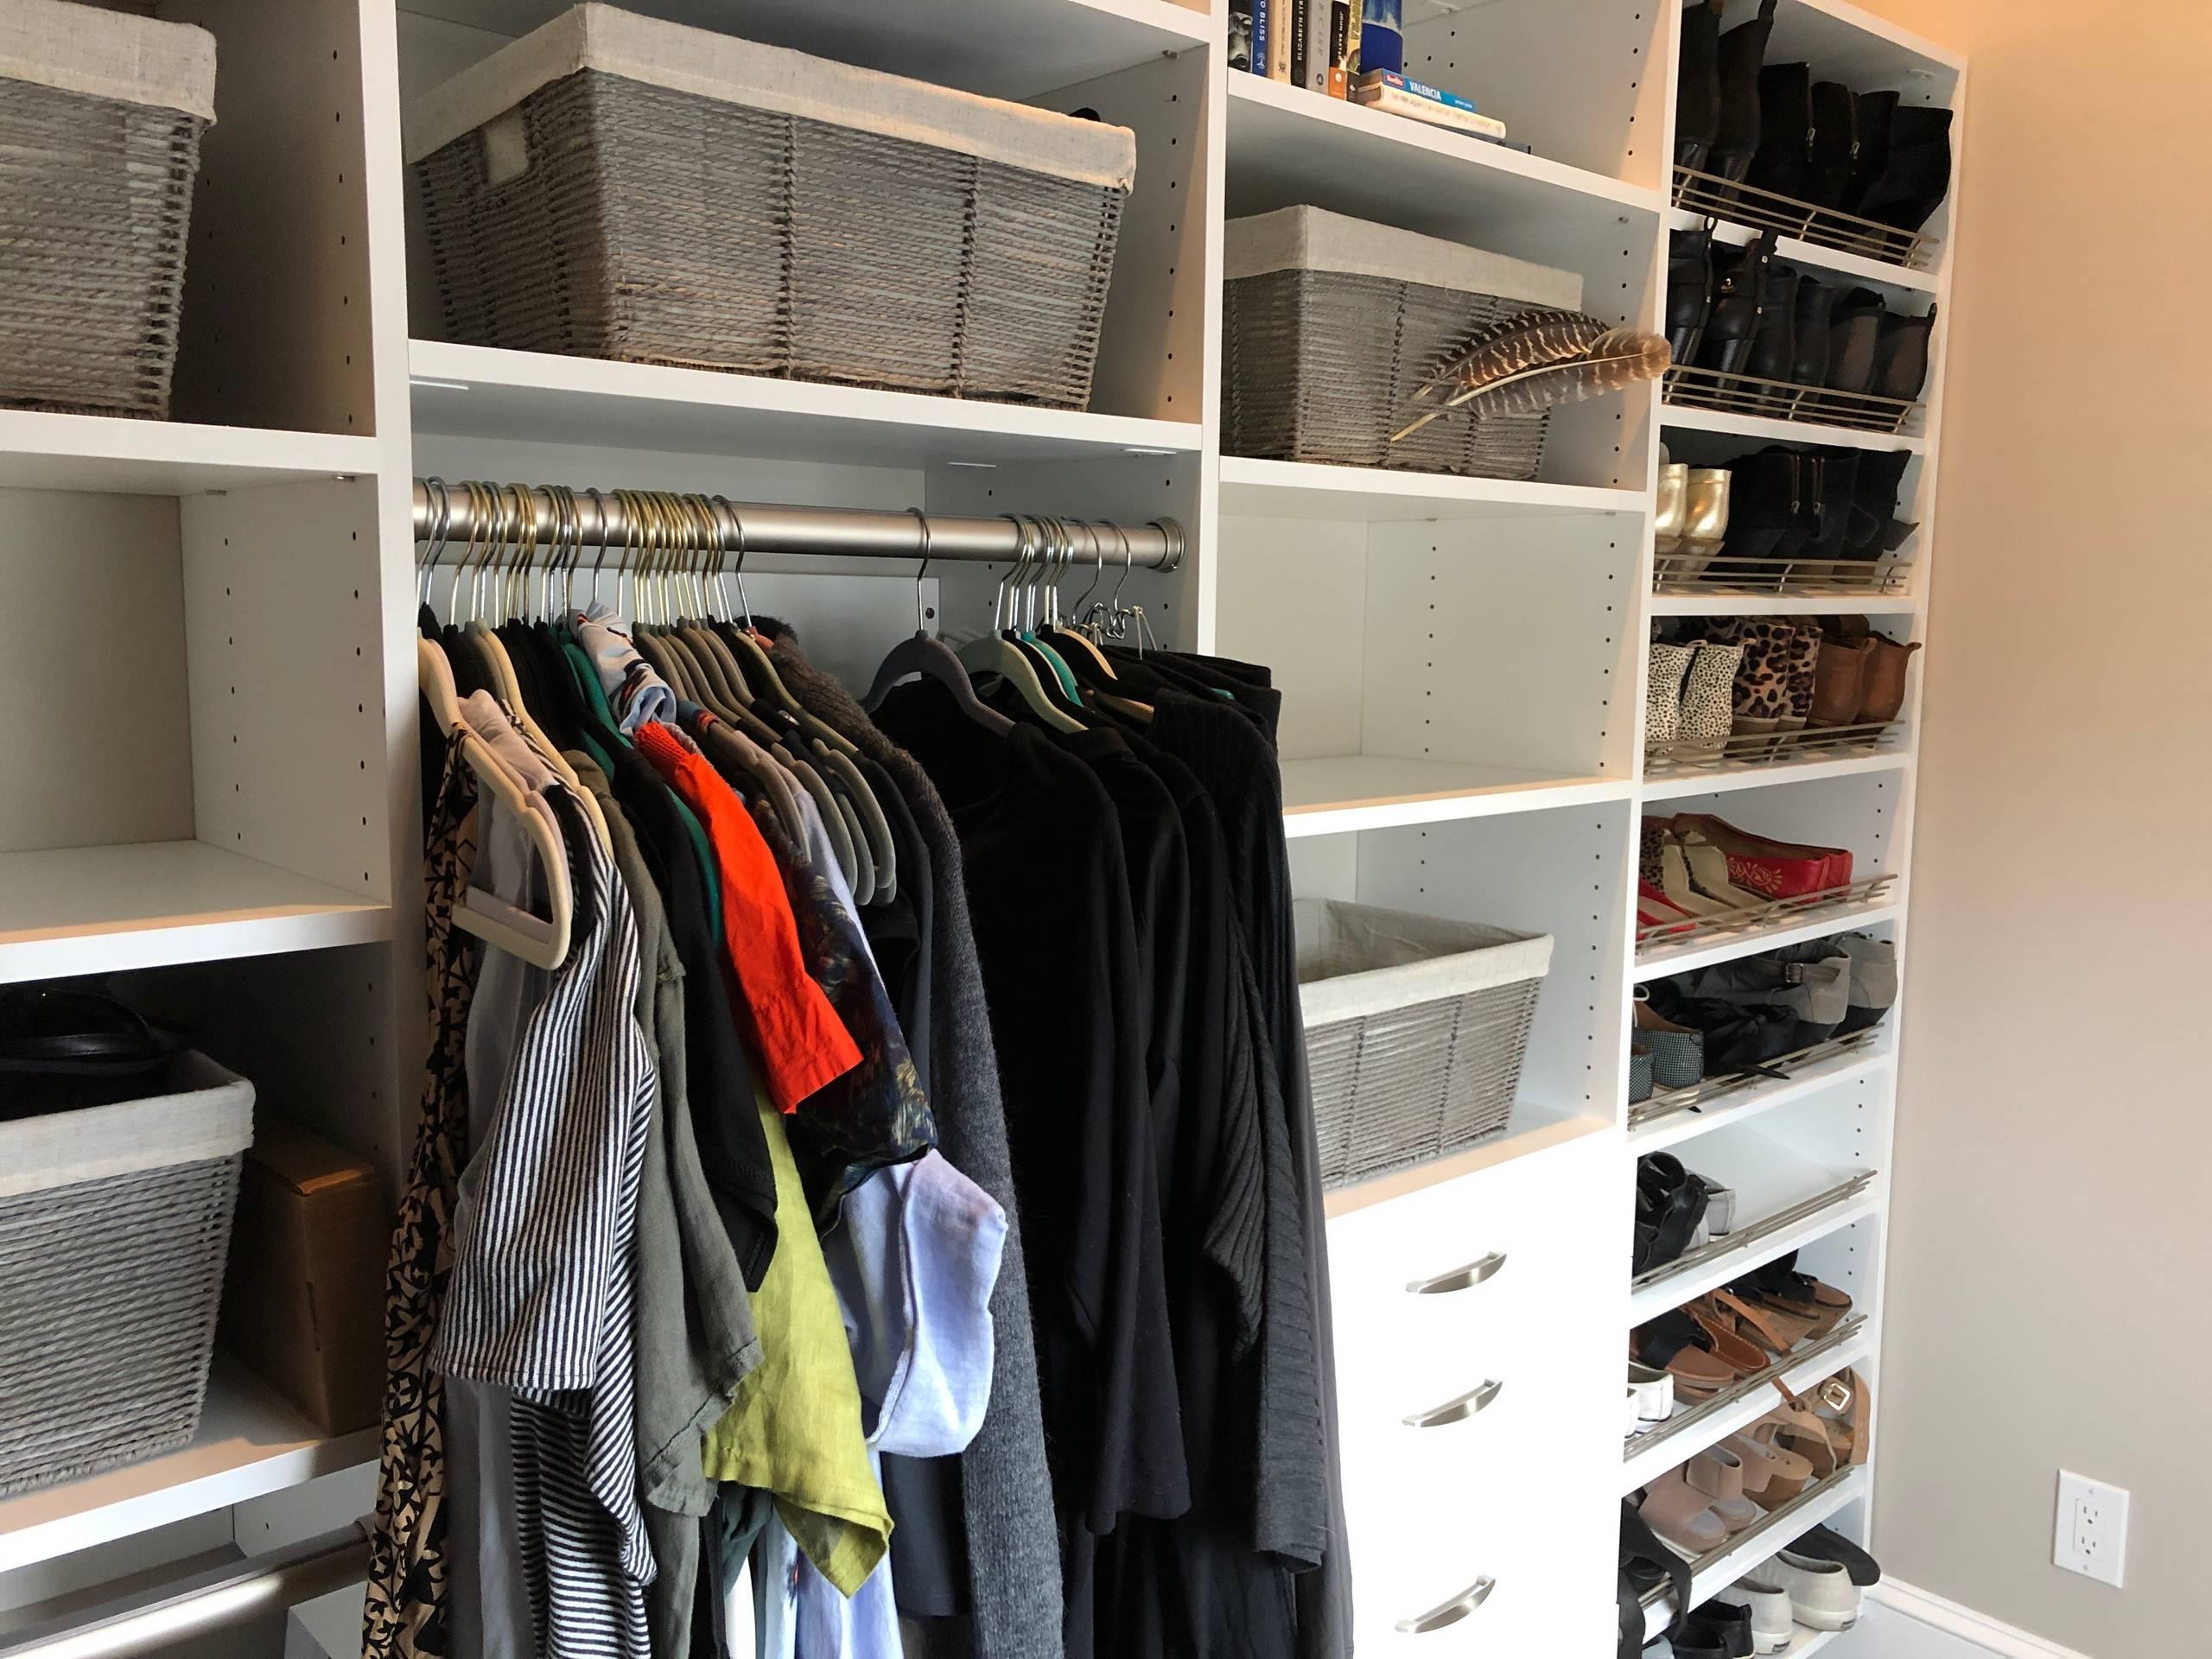 Her Master Closet - After